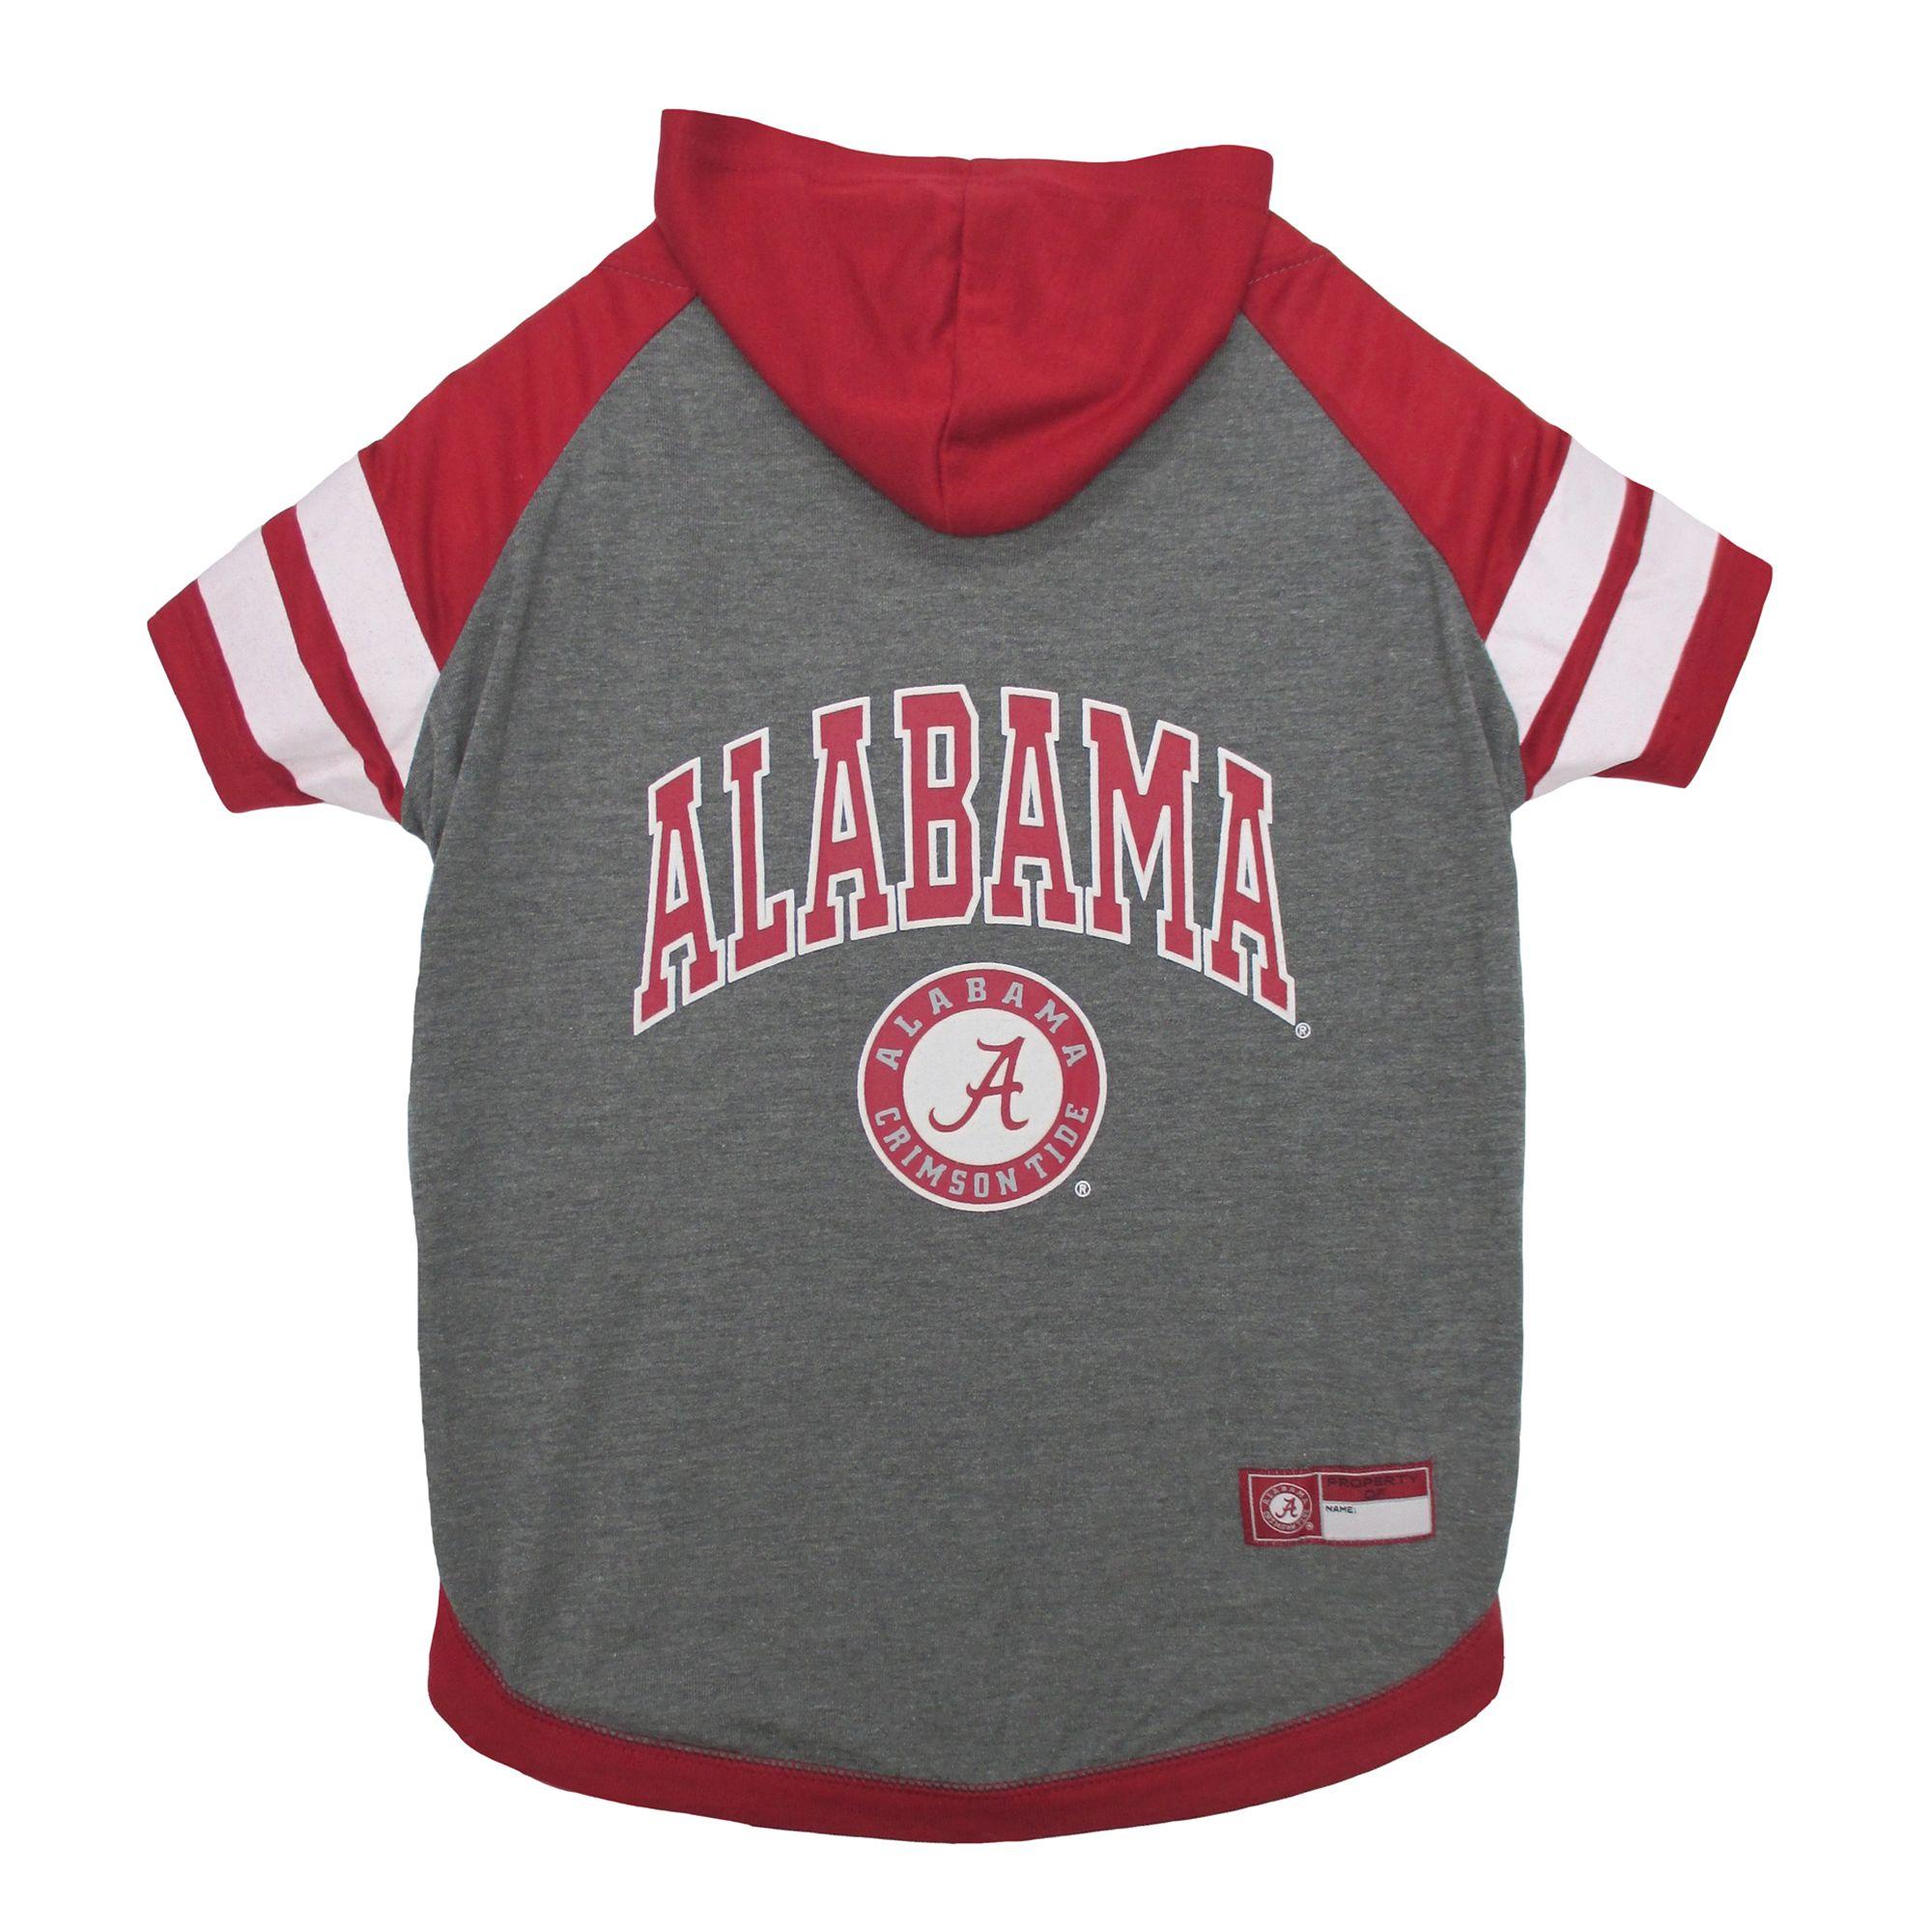 Alabama Crimson Tide Ncaa Hoodie T Shirt Size Small Pets First